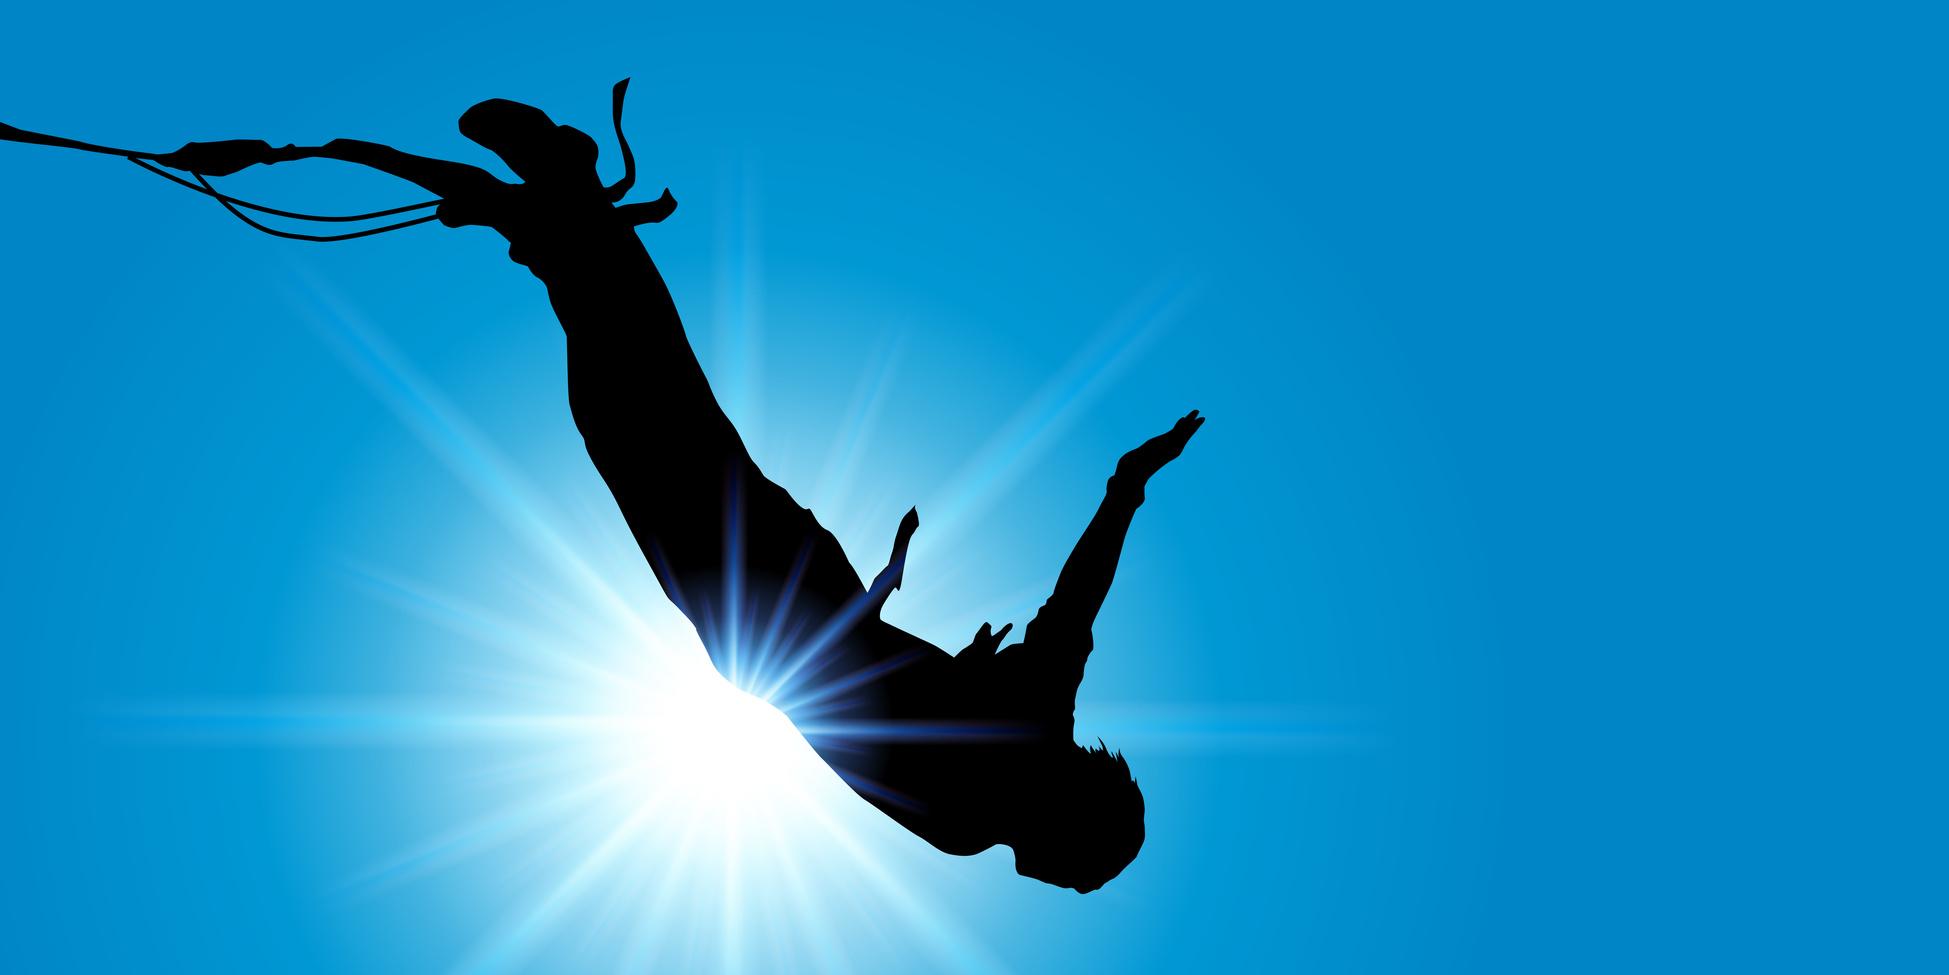 Wegen schlechter Anweisung 17-Jährige stirbt bei Bungee-Jumping!